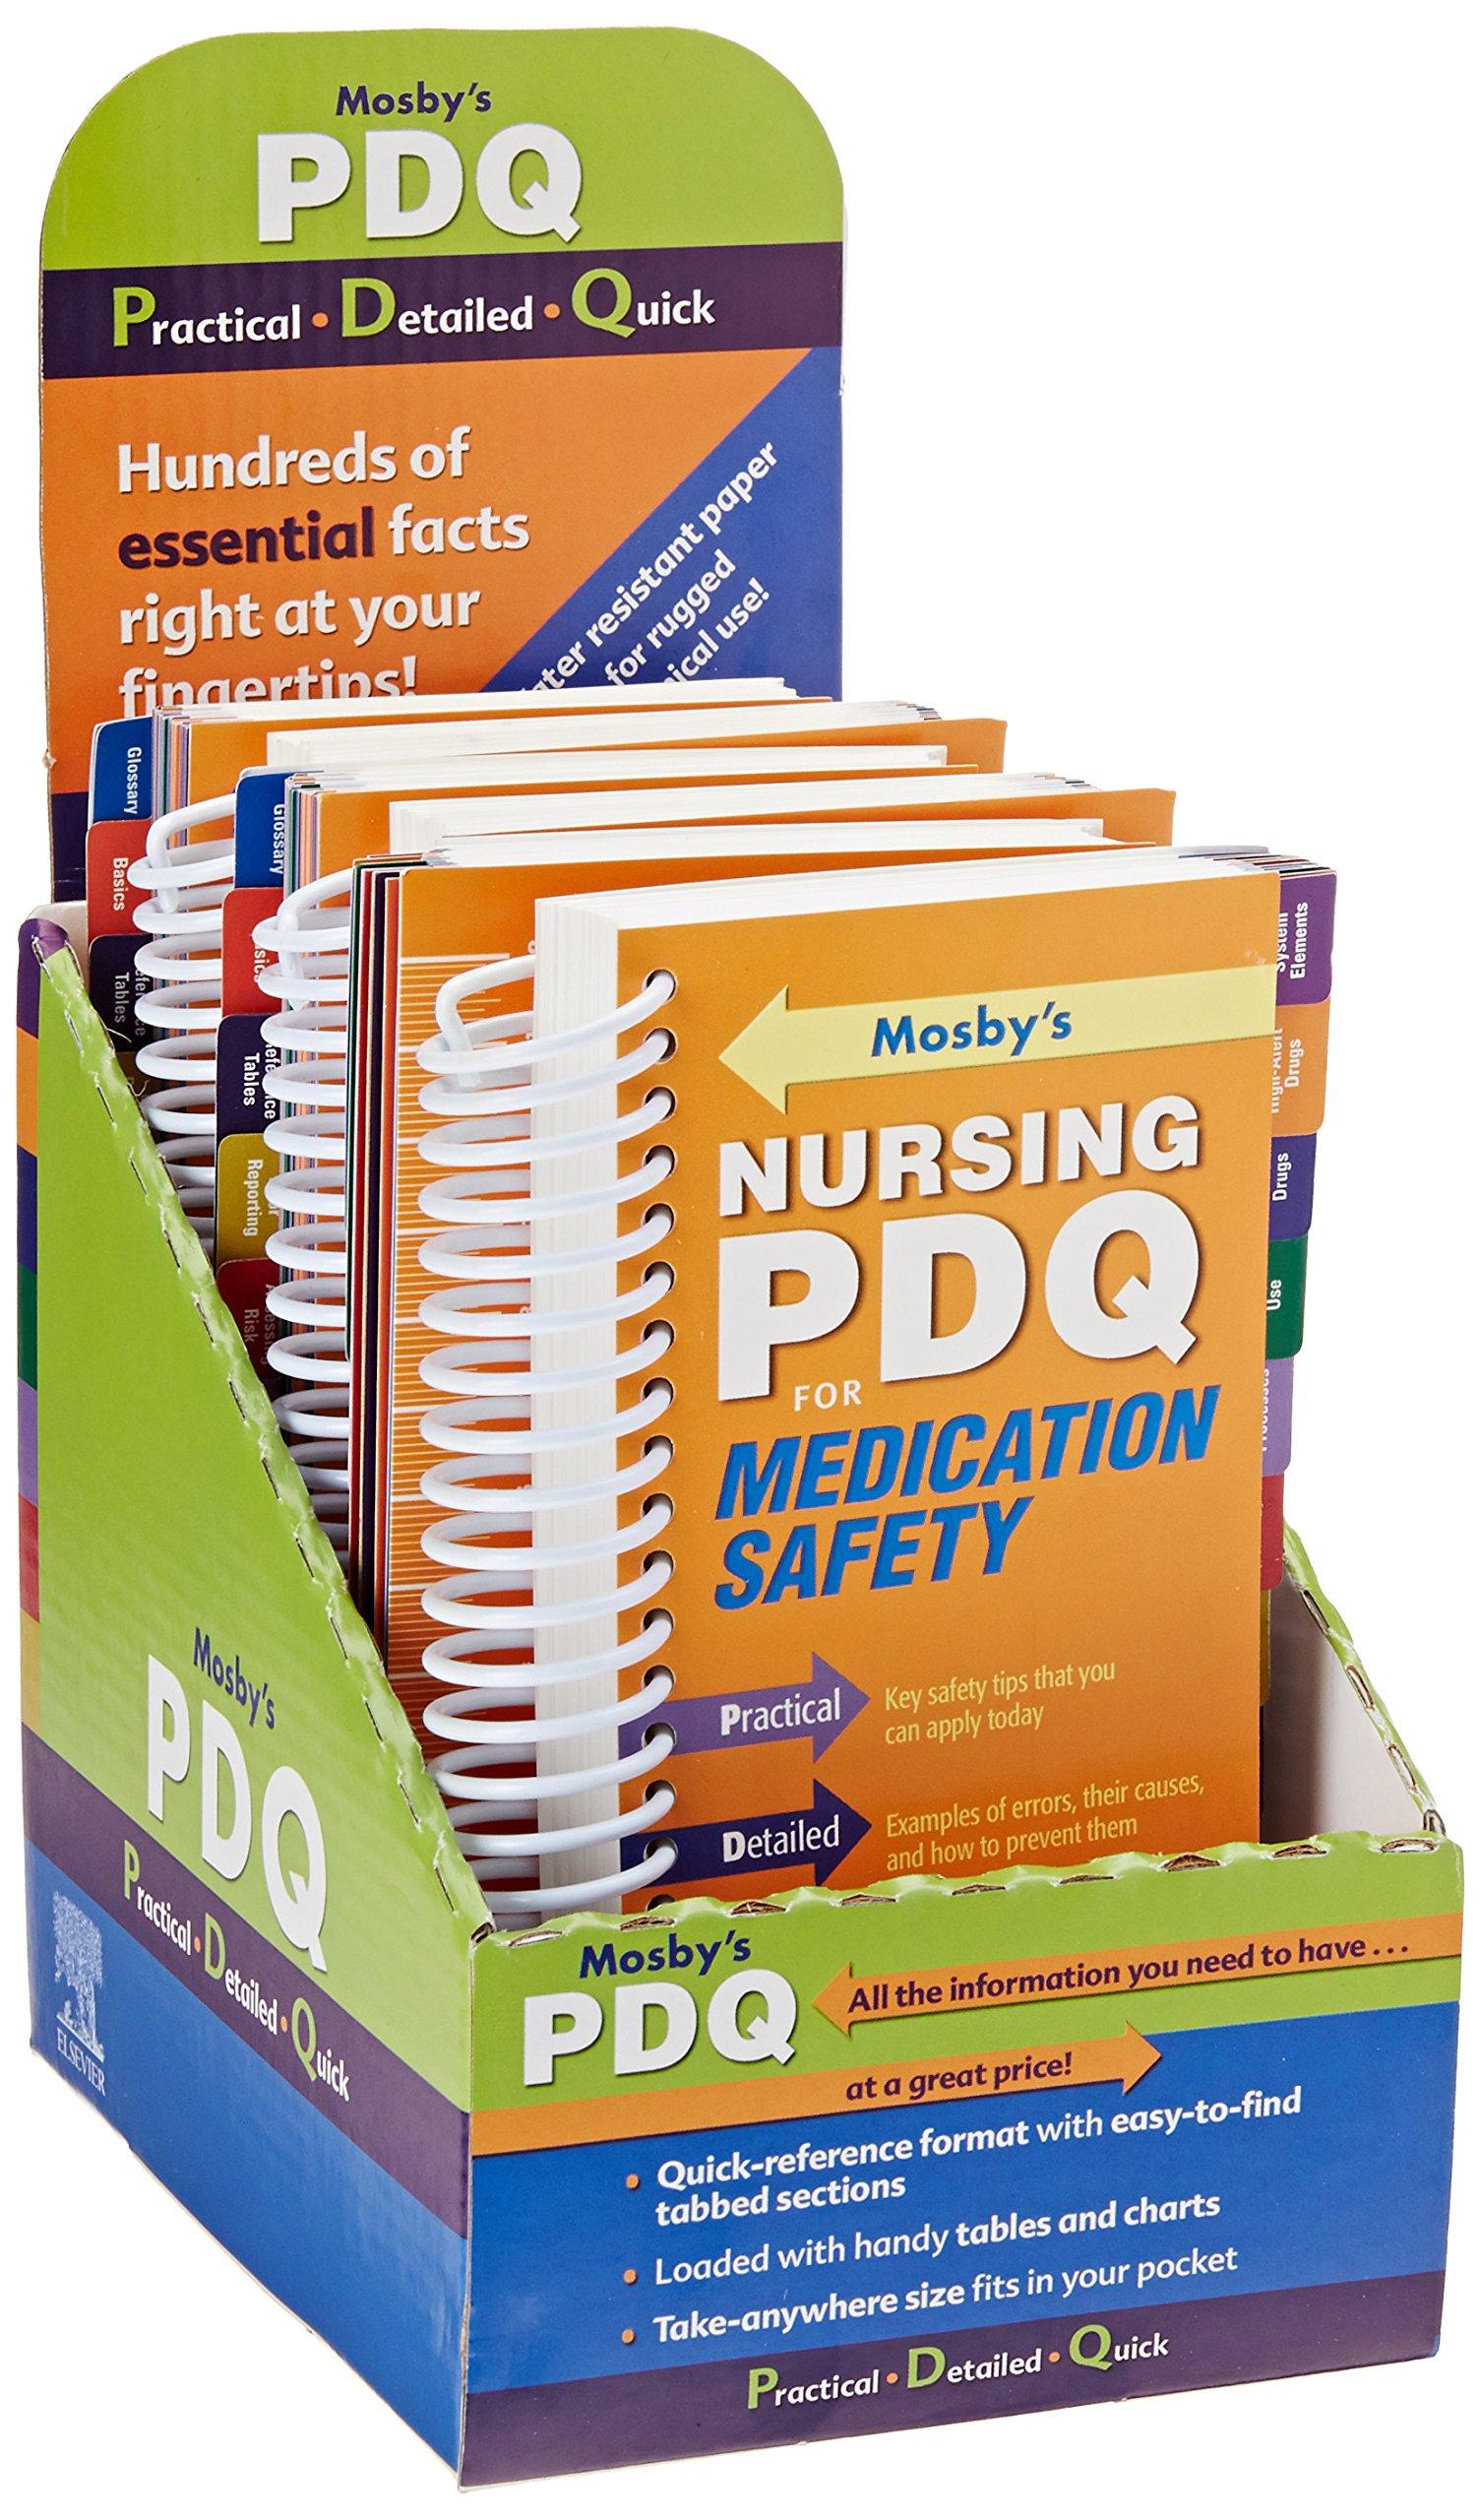 Read Online Mosby's Nursing PDQ for Medication Safety 6 - Pack PDF